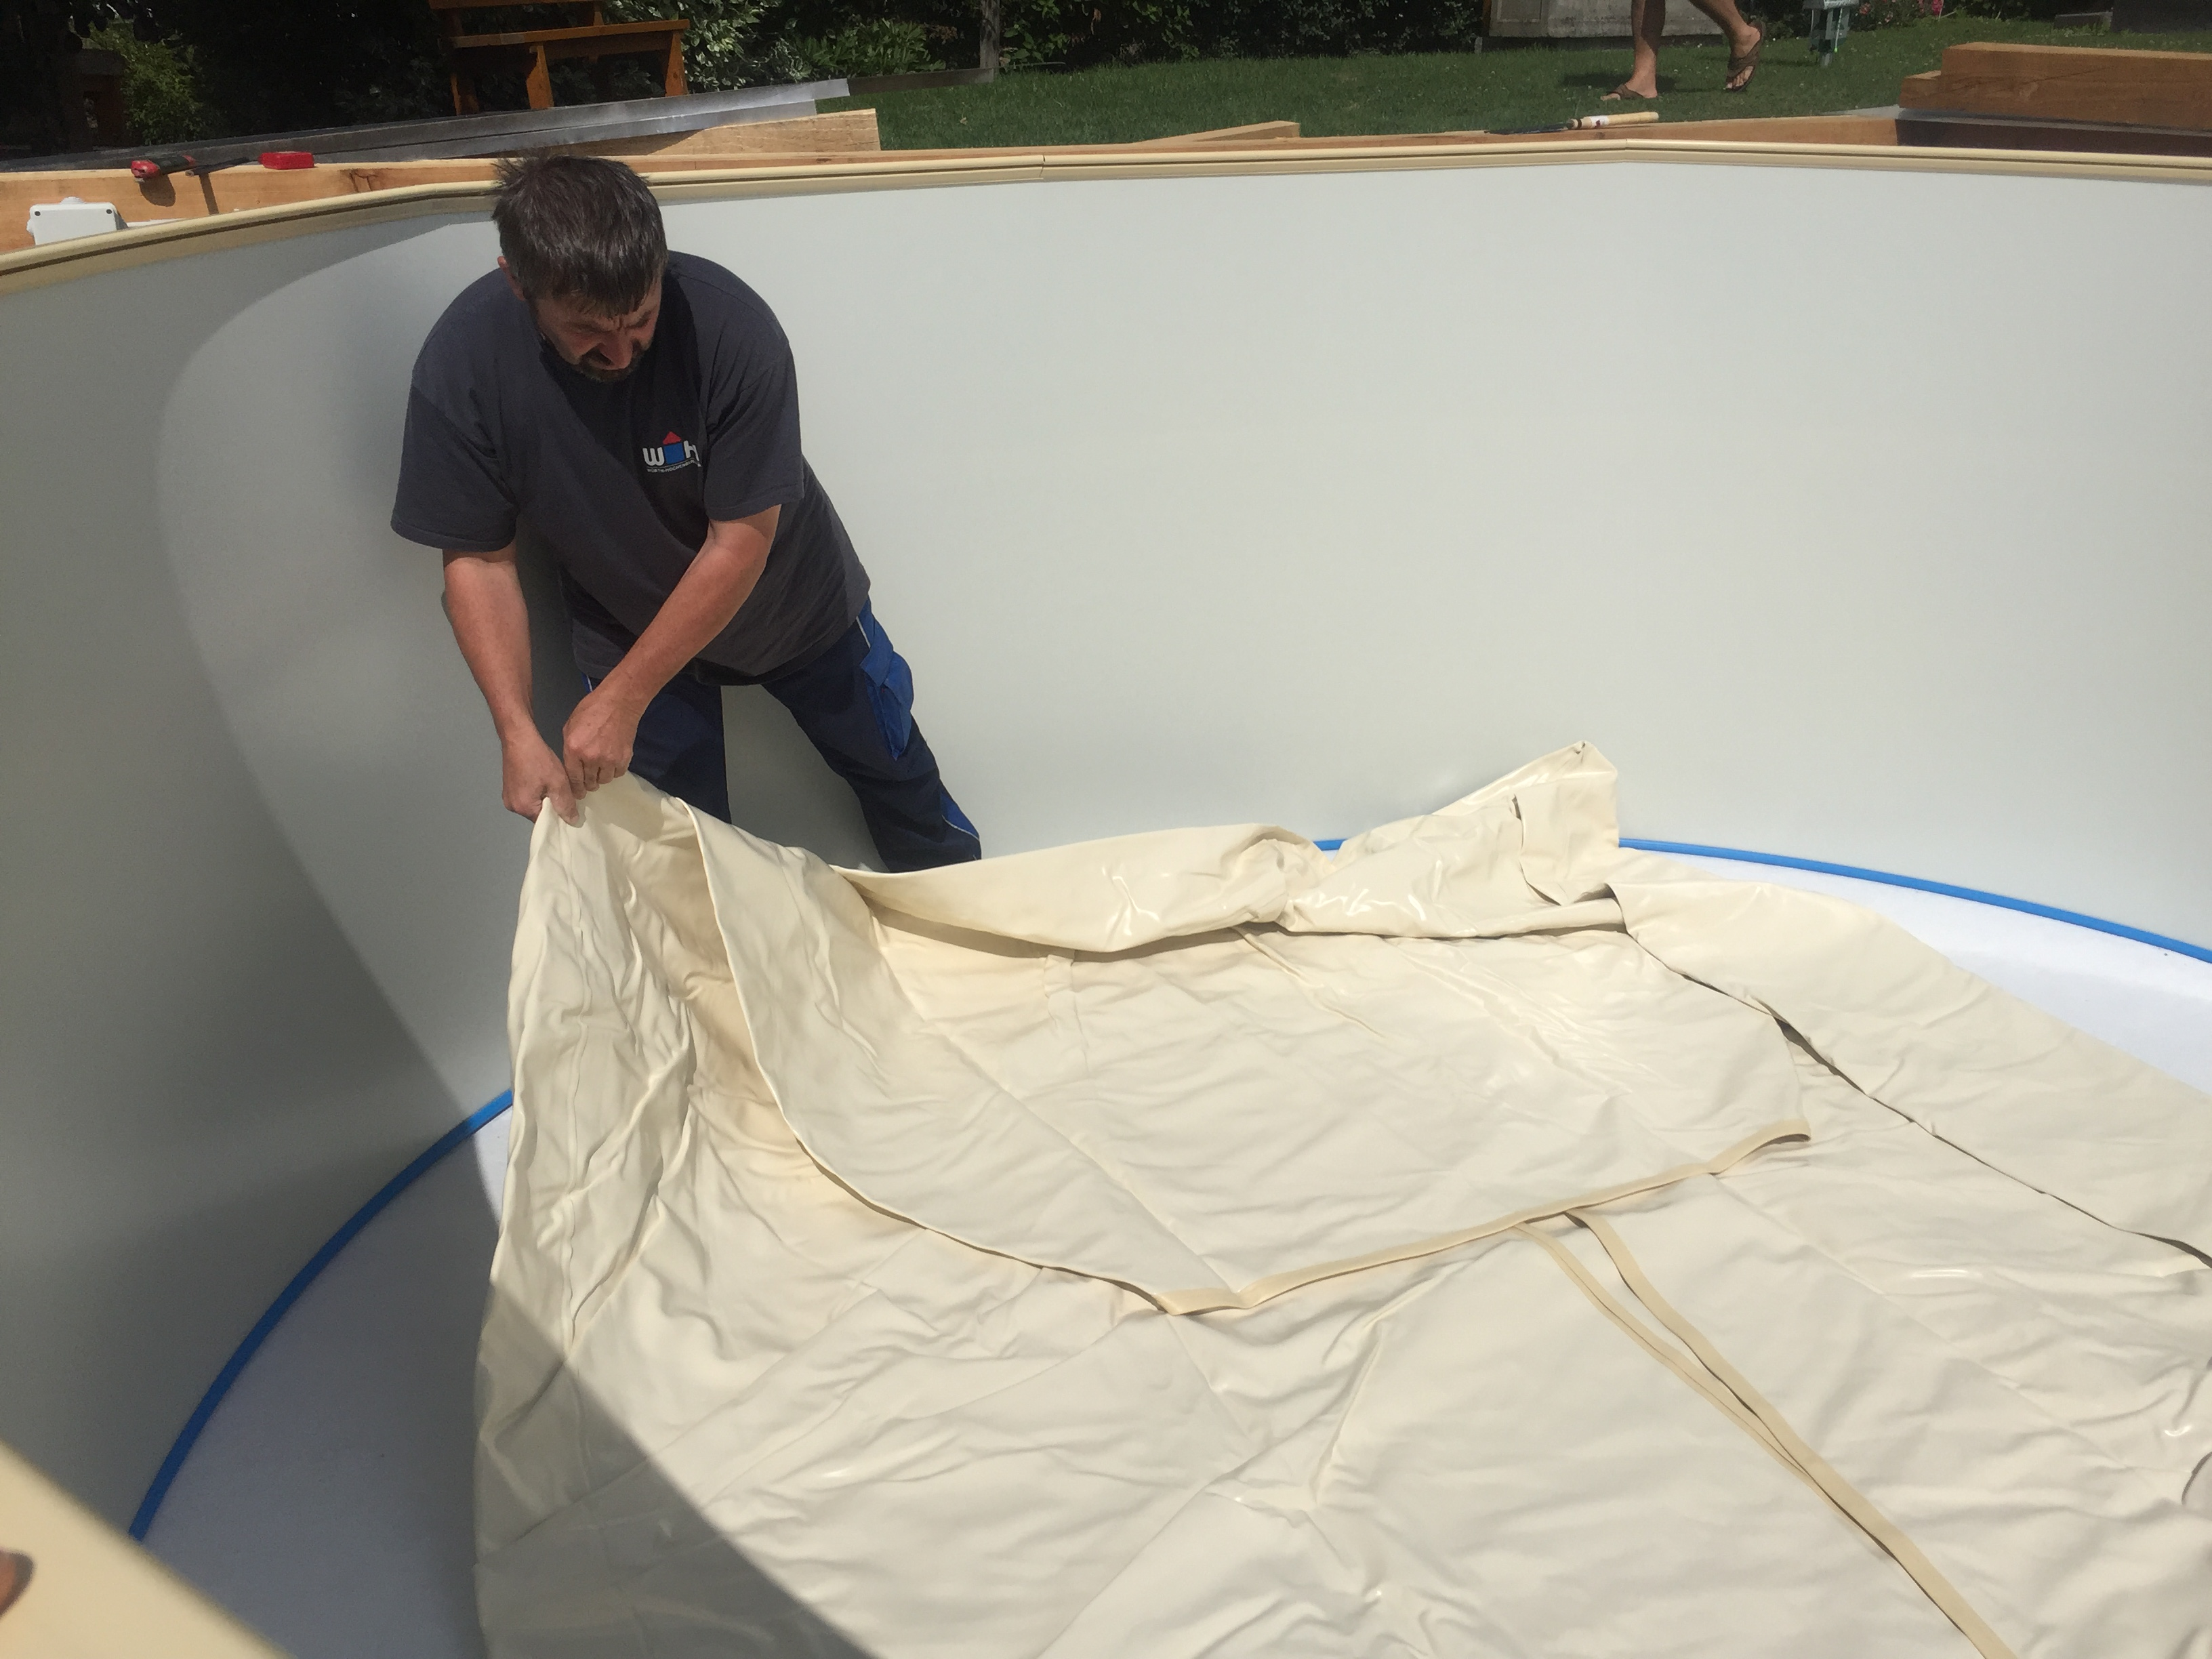 Rundpool prime 250 x 90 cm einzelpool apoolco for Poolfolie montieren